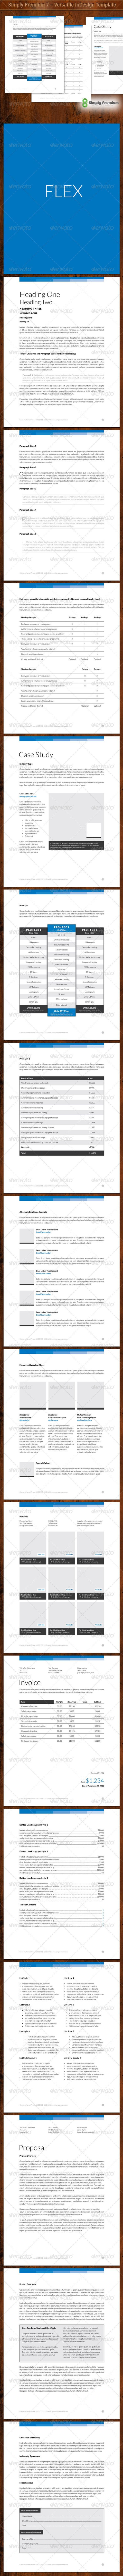 GraphicRiver Simply Premium 7 InDesign Template 2310699